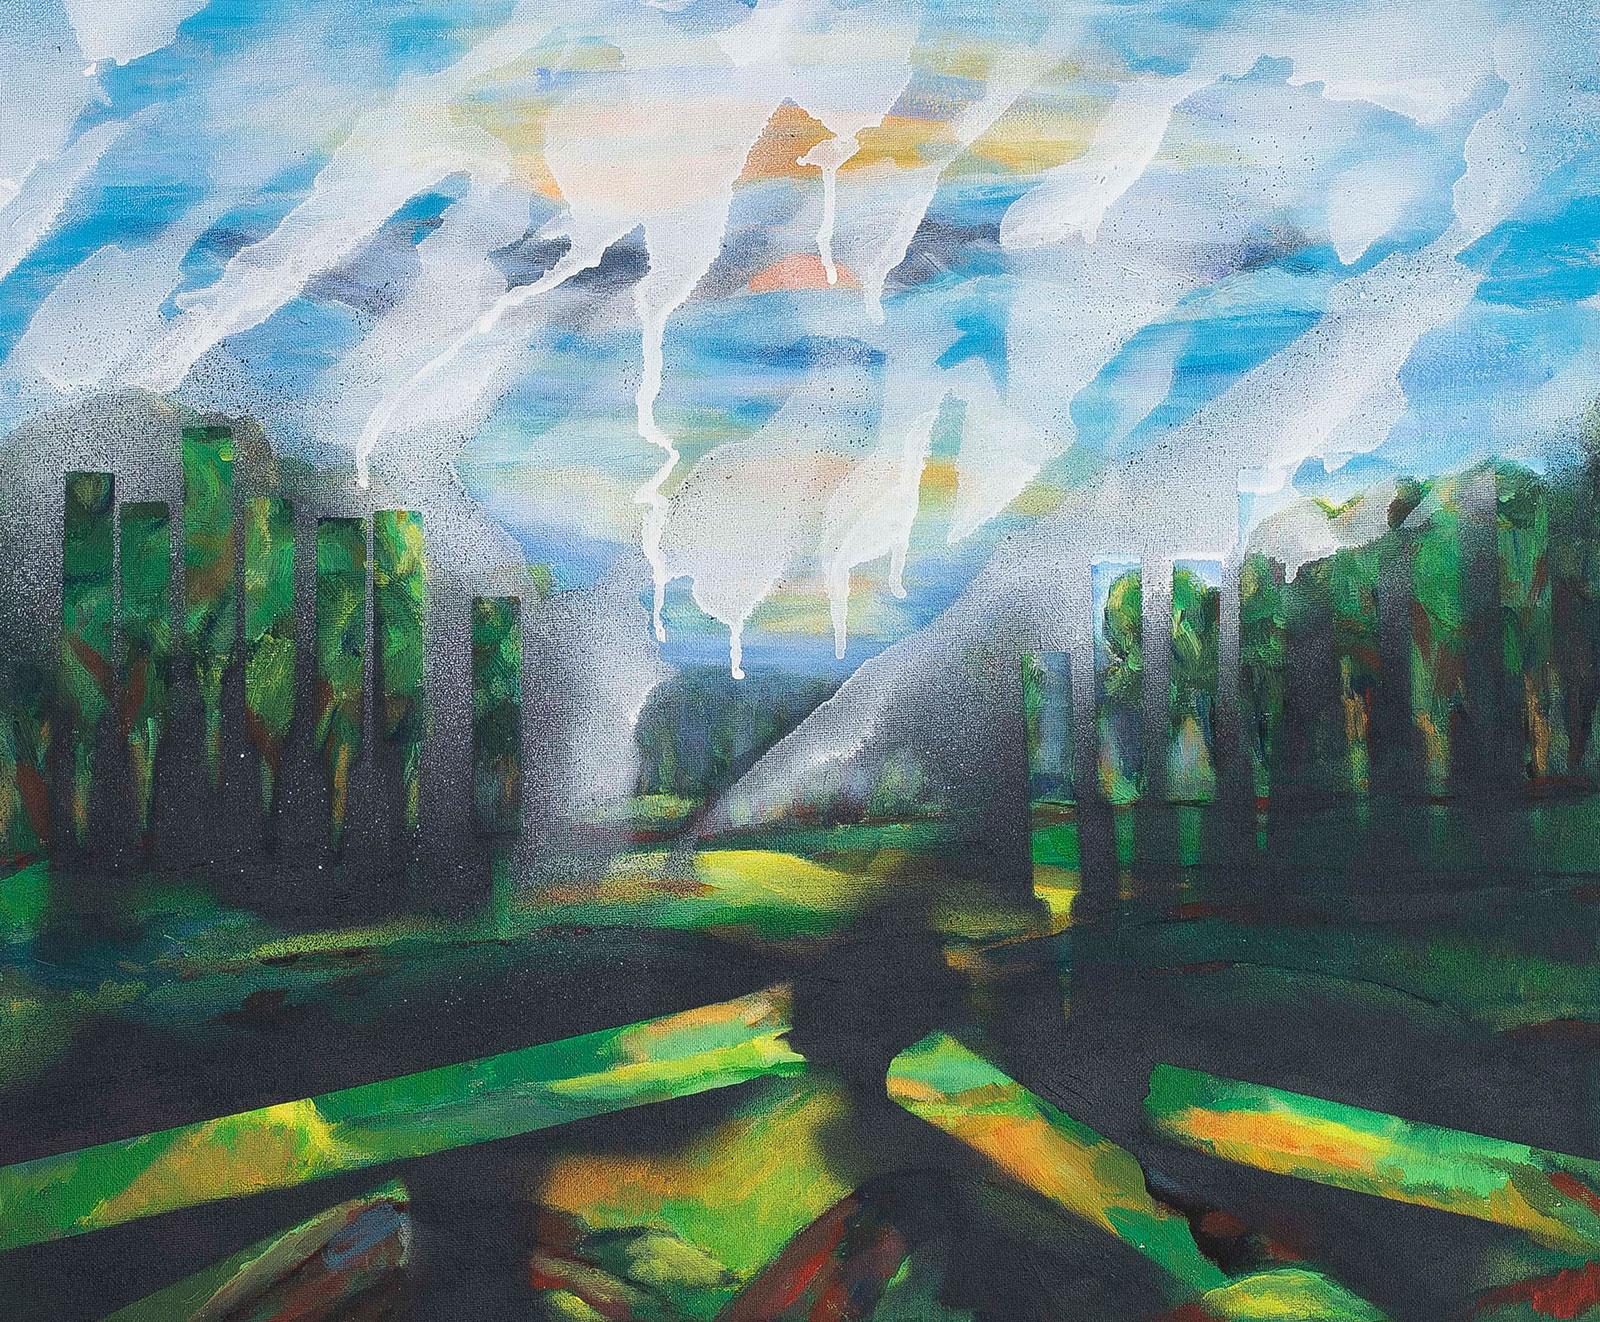 Melting summer #2 | Acryl spray op canvas, 60 x 50